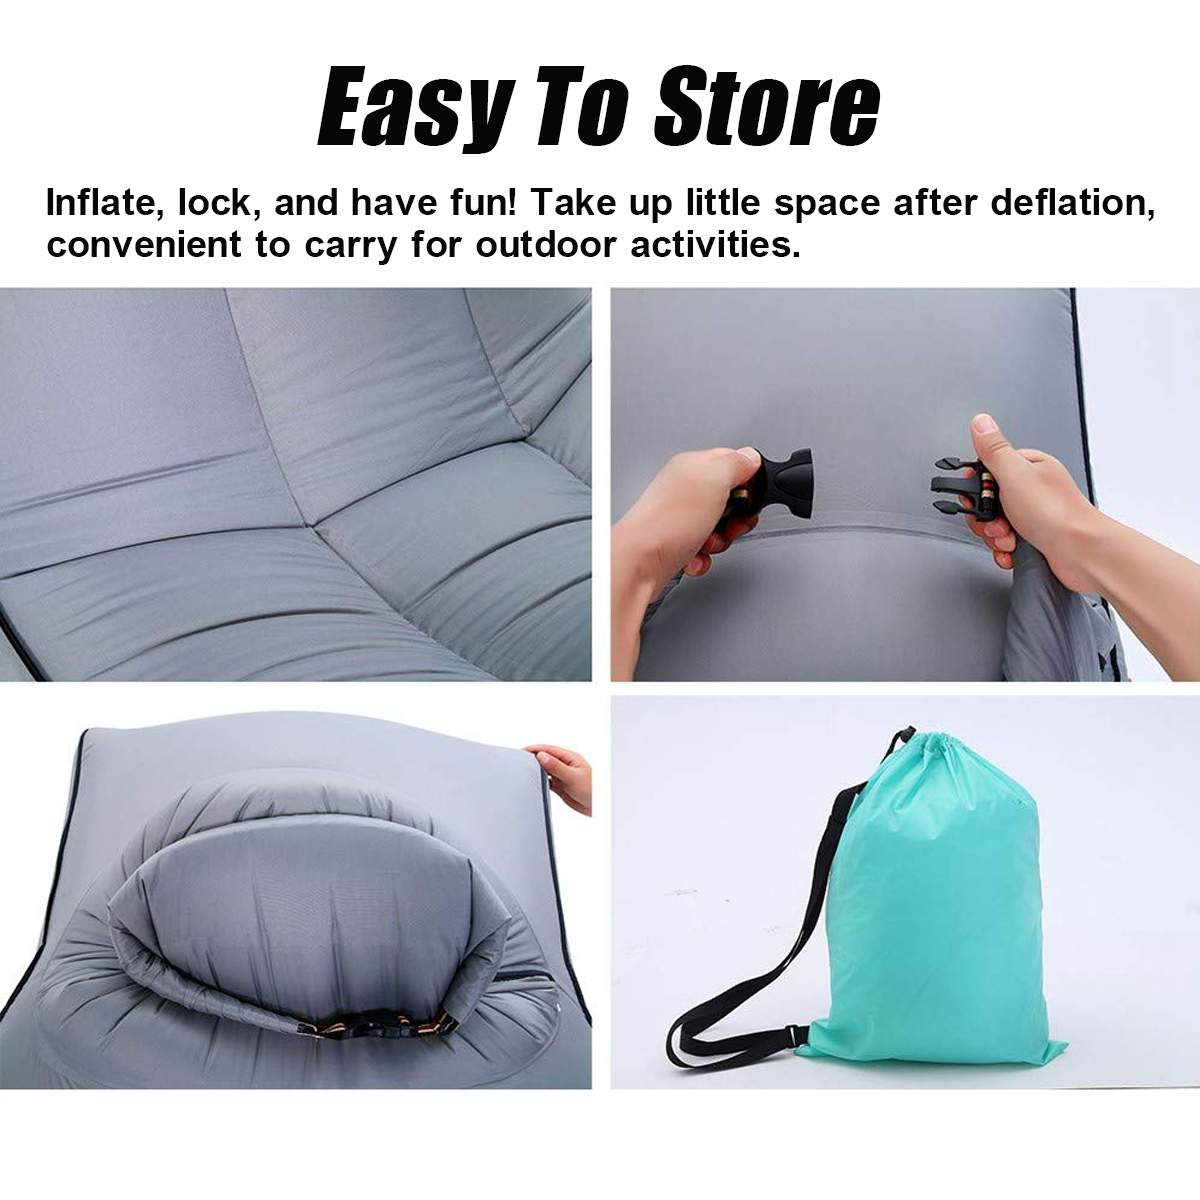 Fantastic Outdoor Inflatable Sofa Couch Lounge Chair Beach Camp Chaise Machost Co Dining Chair Design Ideas Machostcouk